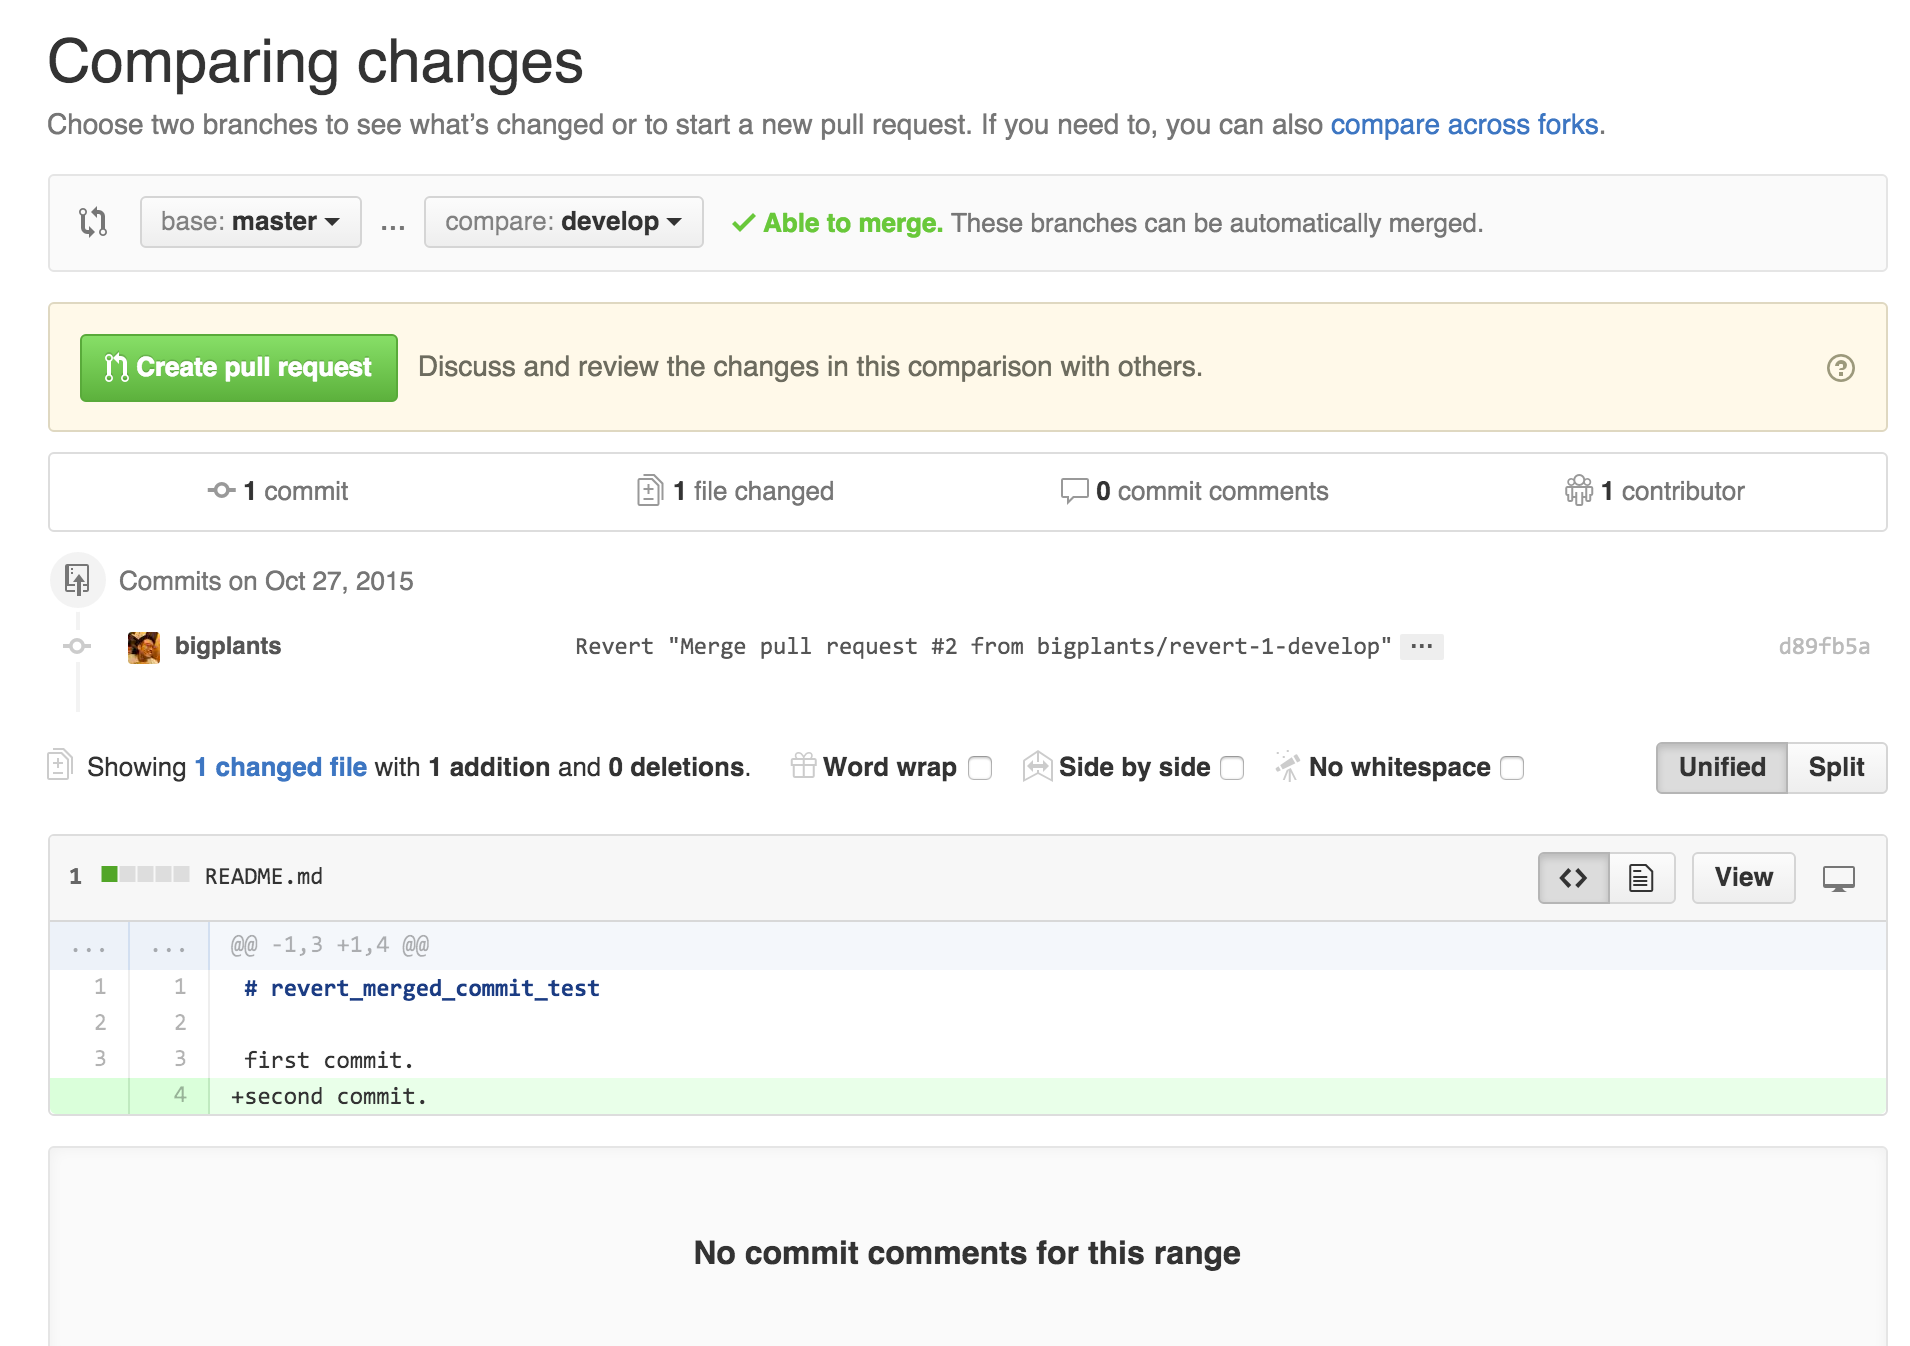 Comparing_master___develop_·_bigplants_revert_merged_commit_test.png